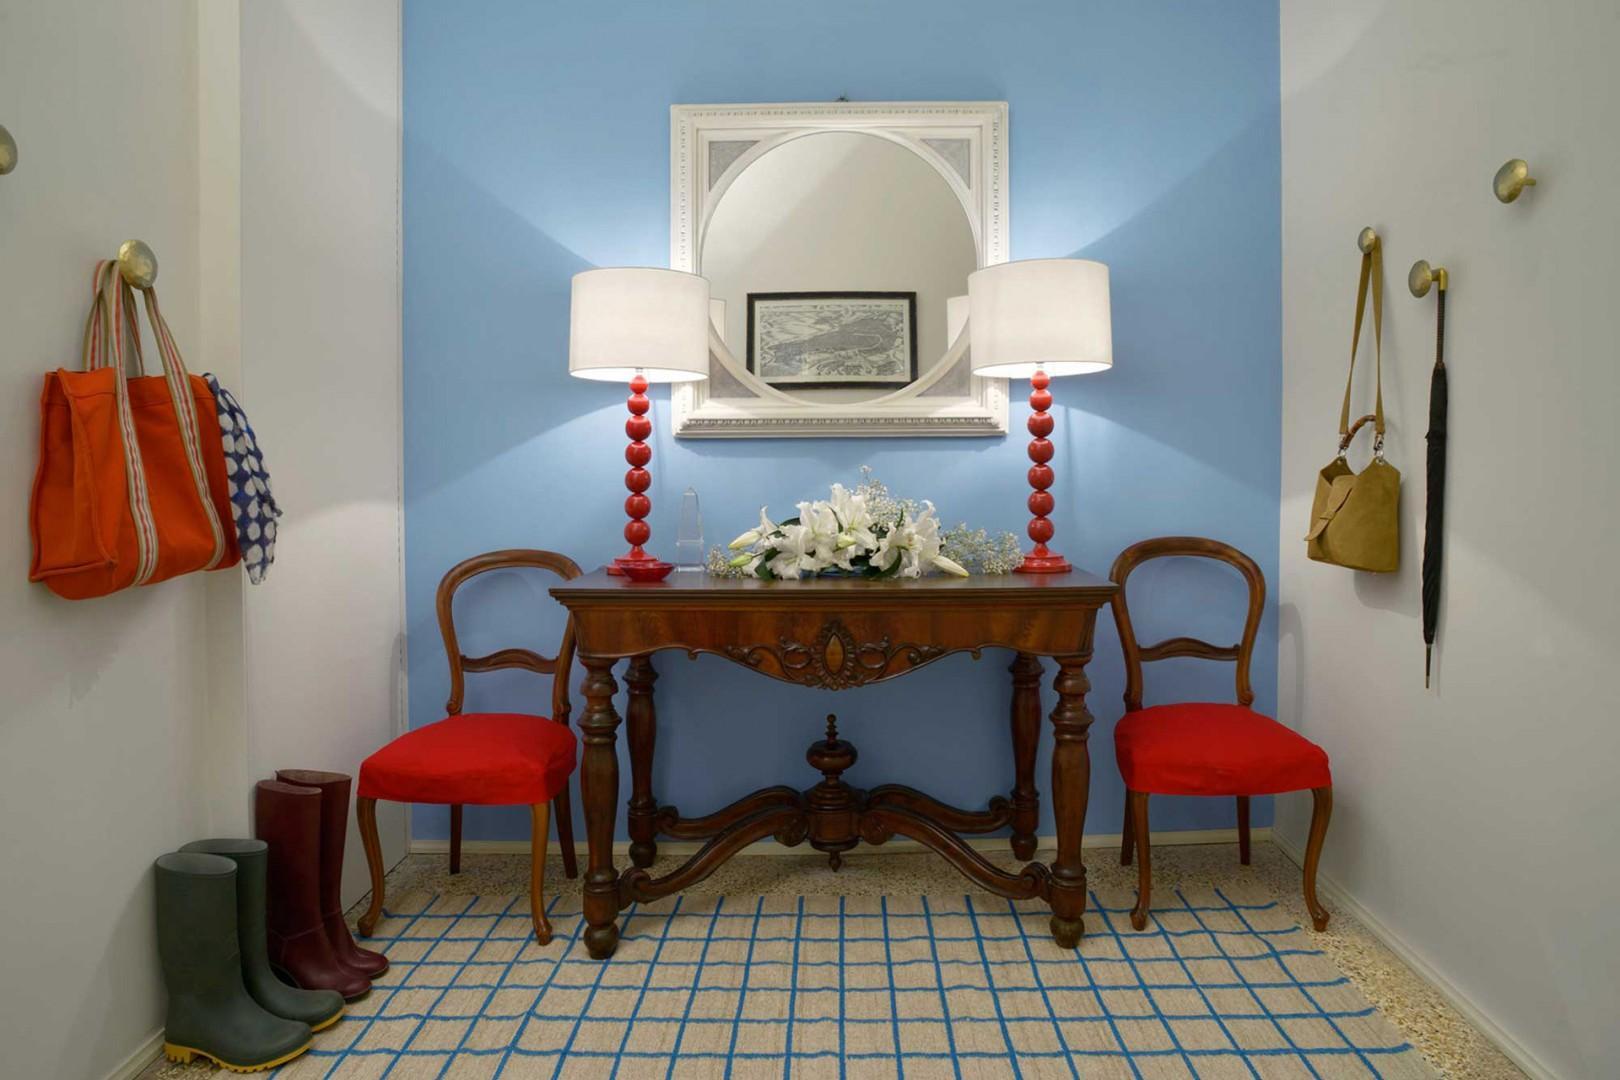 Entry of fine Venetian apartment.